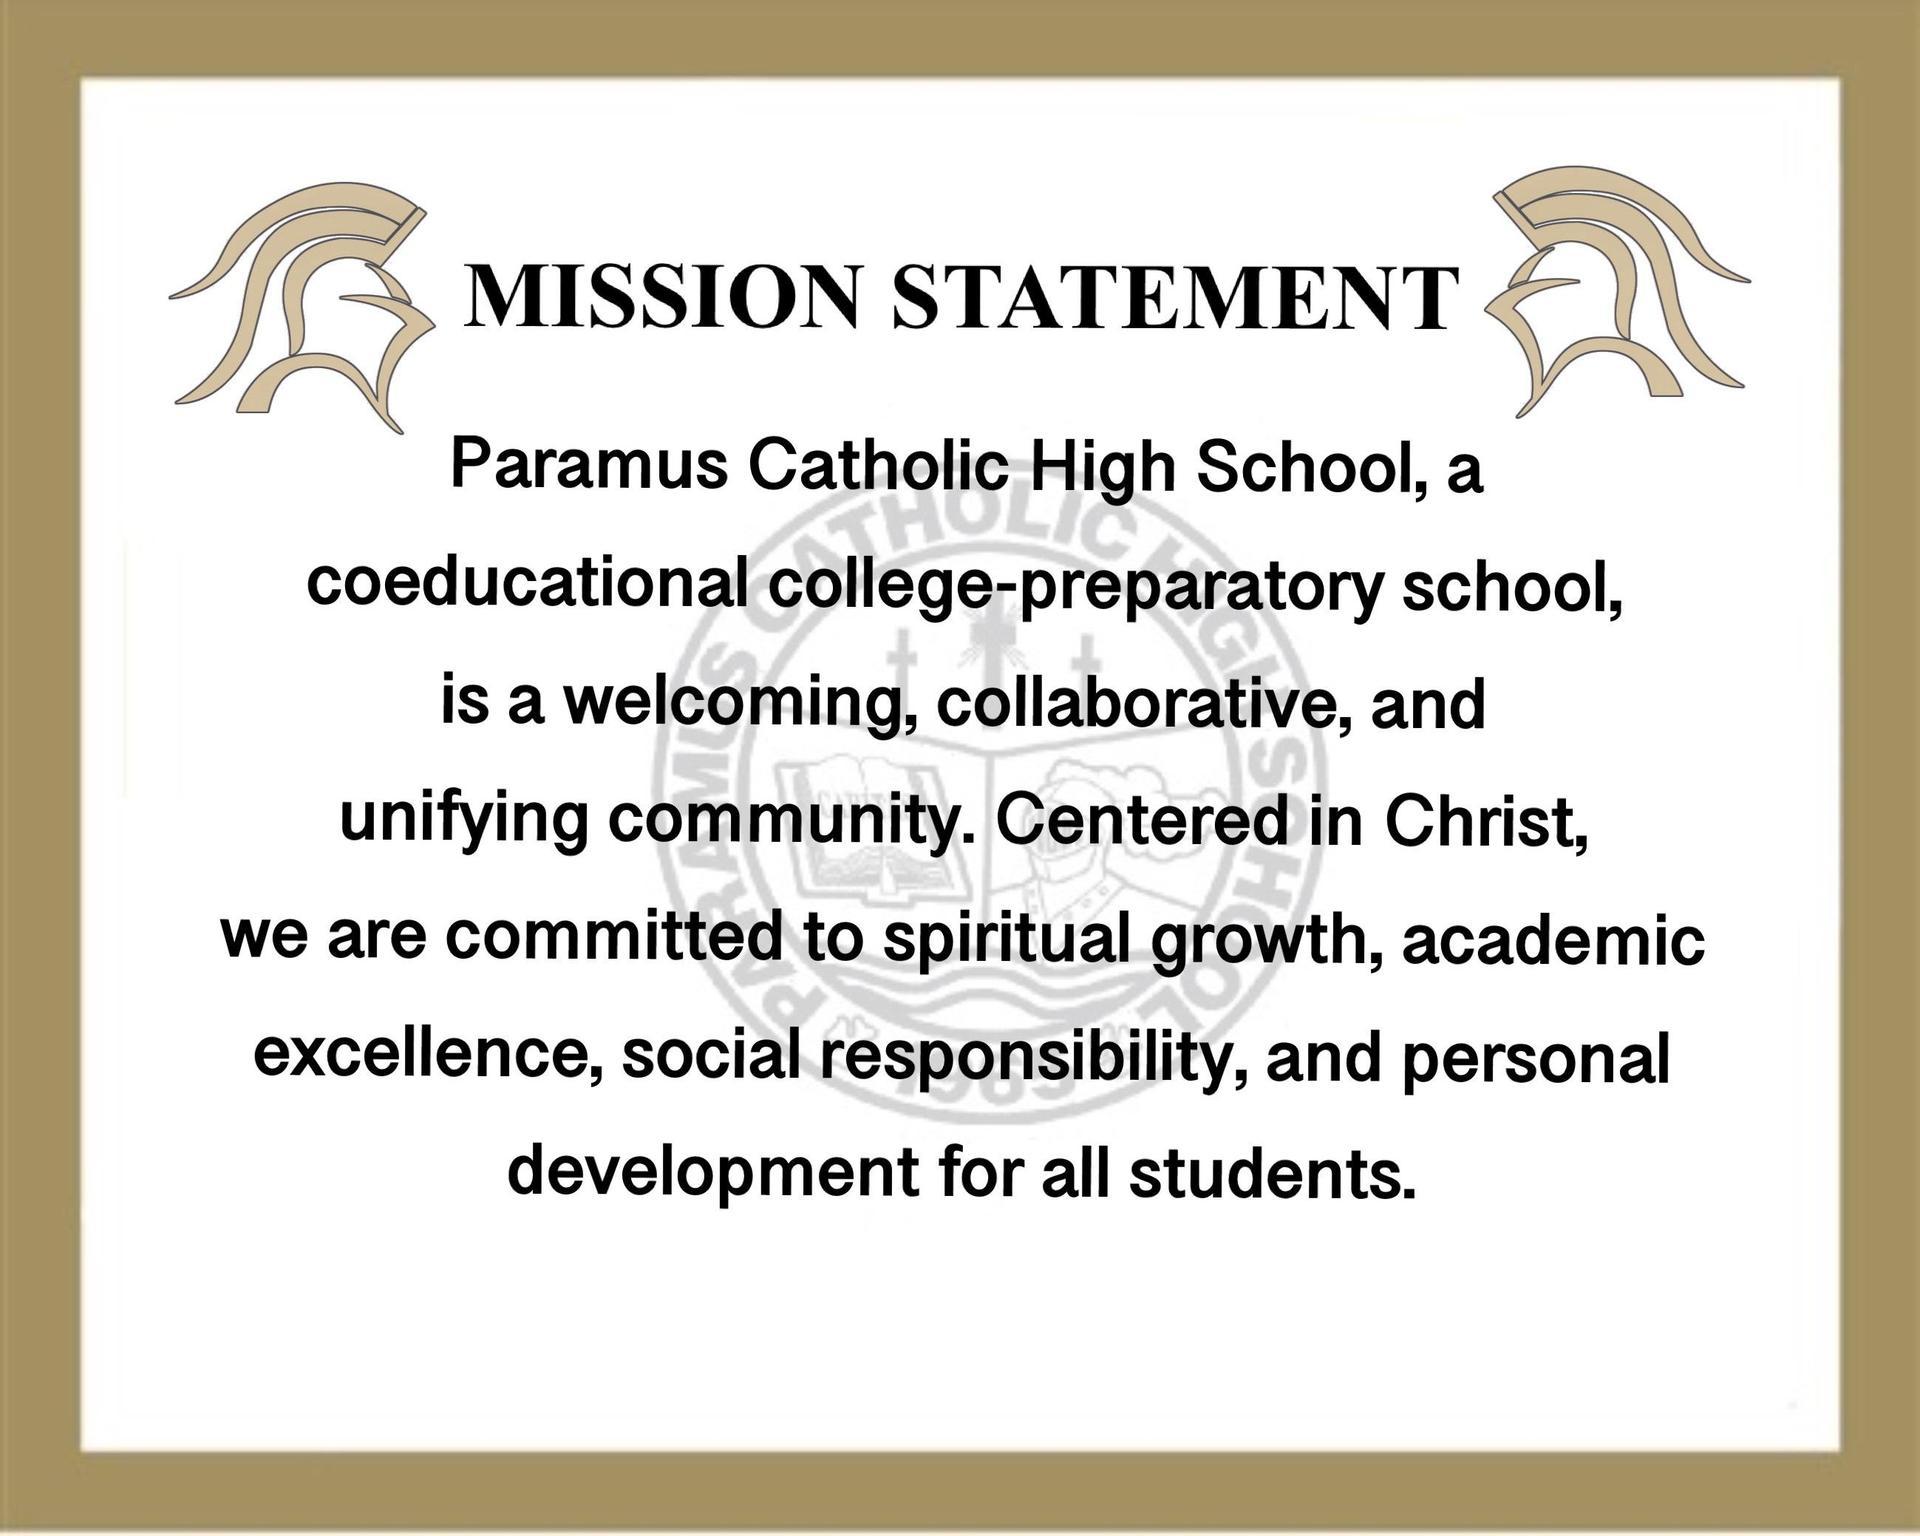 Paramus Catholic High School Mission Statement